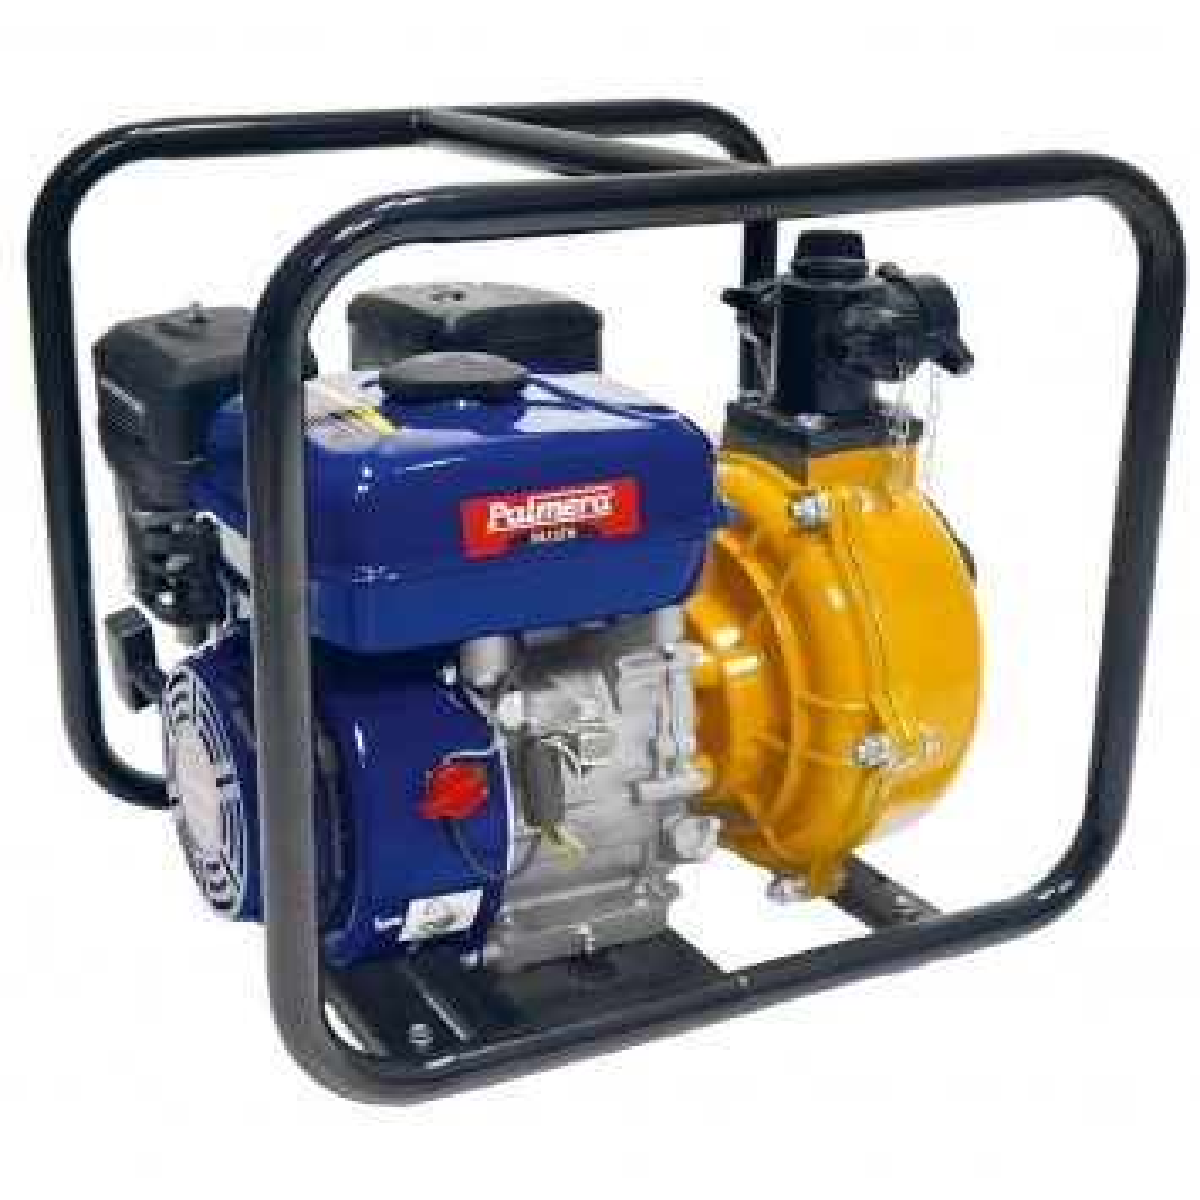 Palmera PA15TH Yüksek Basınçlı Su Motoru 1.5